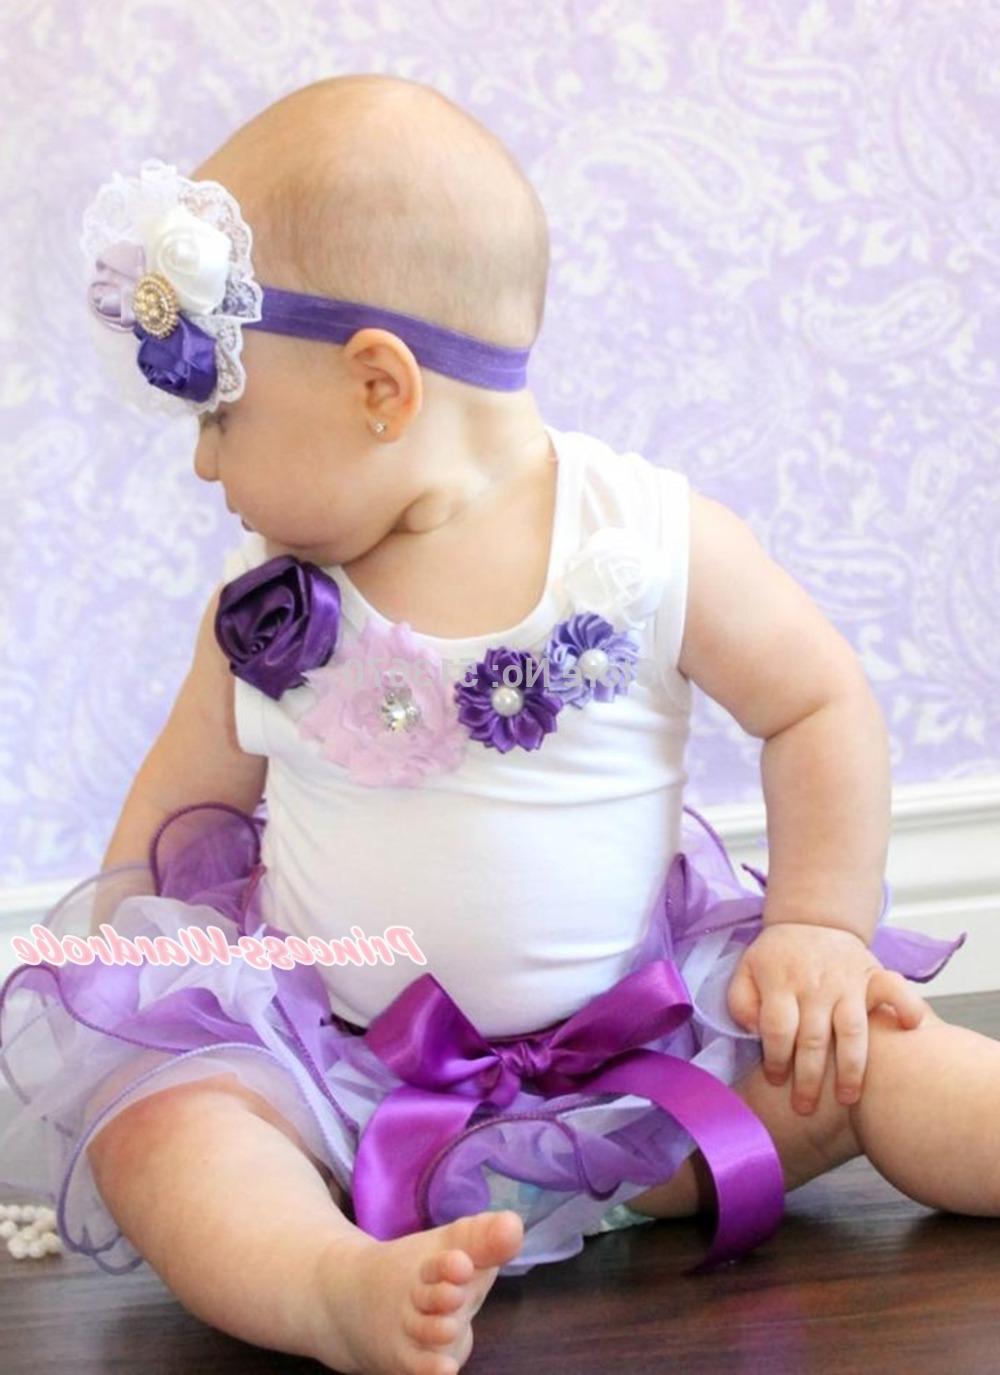 32.99$  Buy now - https://alitems.com/g/1e8d114494b01f4c715516525dc3e8/?i=5&ulp=https%3A%2F%2Fwww.aliexpress.com%2Fitem%2FBaby-Girl-Pearl-Flower-White-Top-Purple-Lavender-Petal-Pettiskirt-Set-NB-8Y-MAMG620%2F2018041953.html - Baby Girl Pearl Flower White Top Purple Lavender Petal Pettiskirt Set NB-8Y MAMG620 32.99$